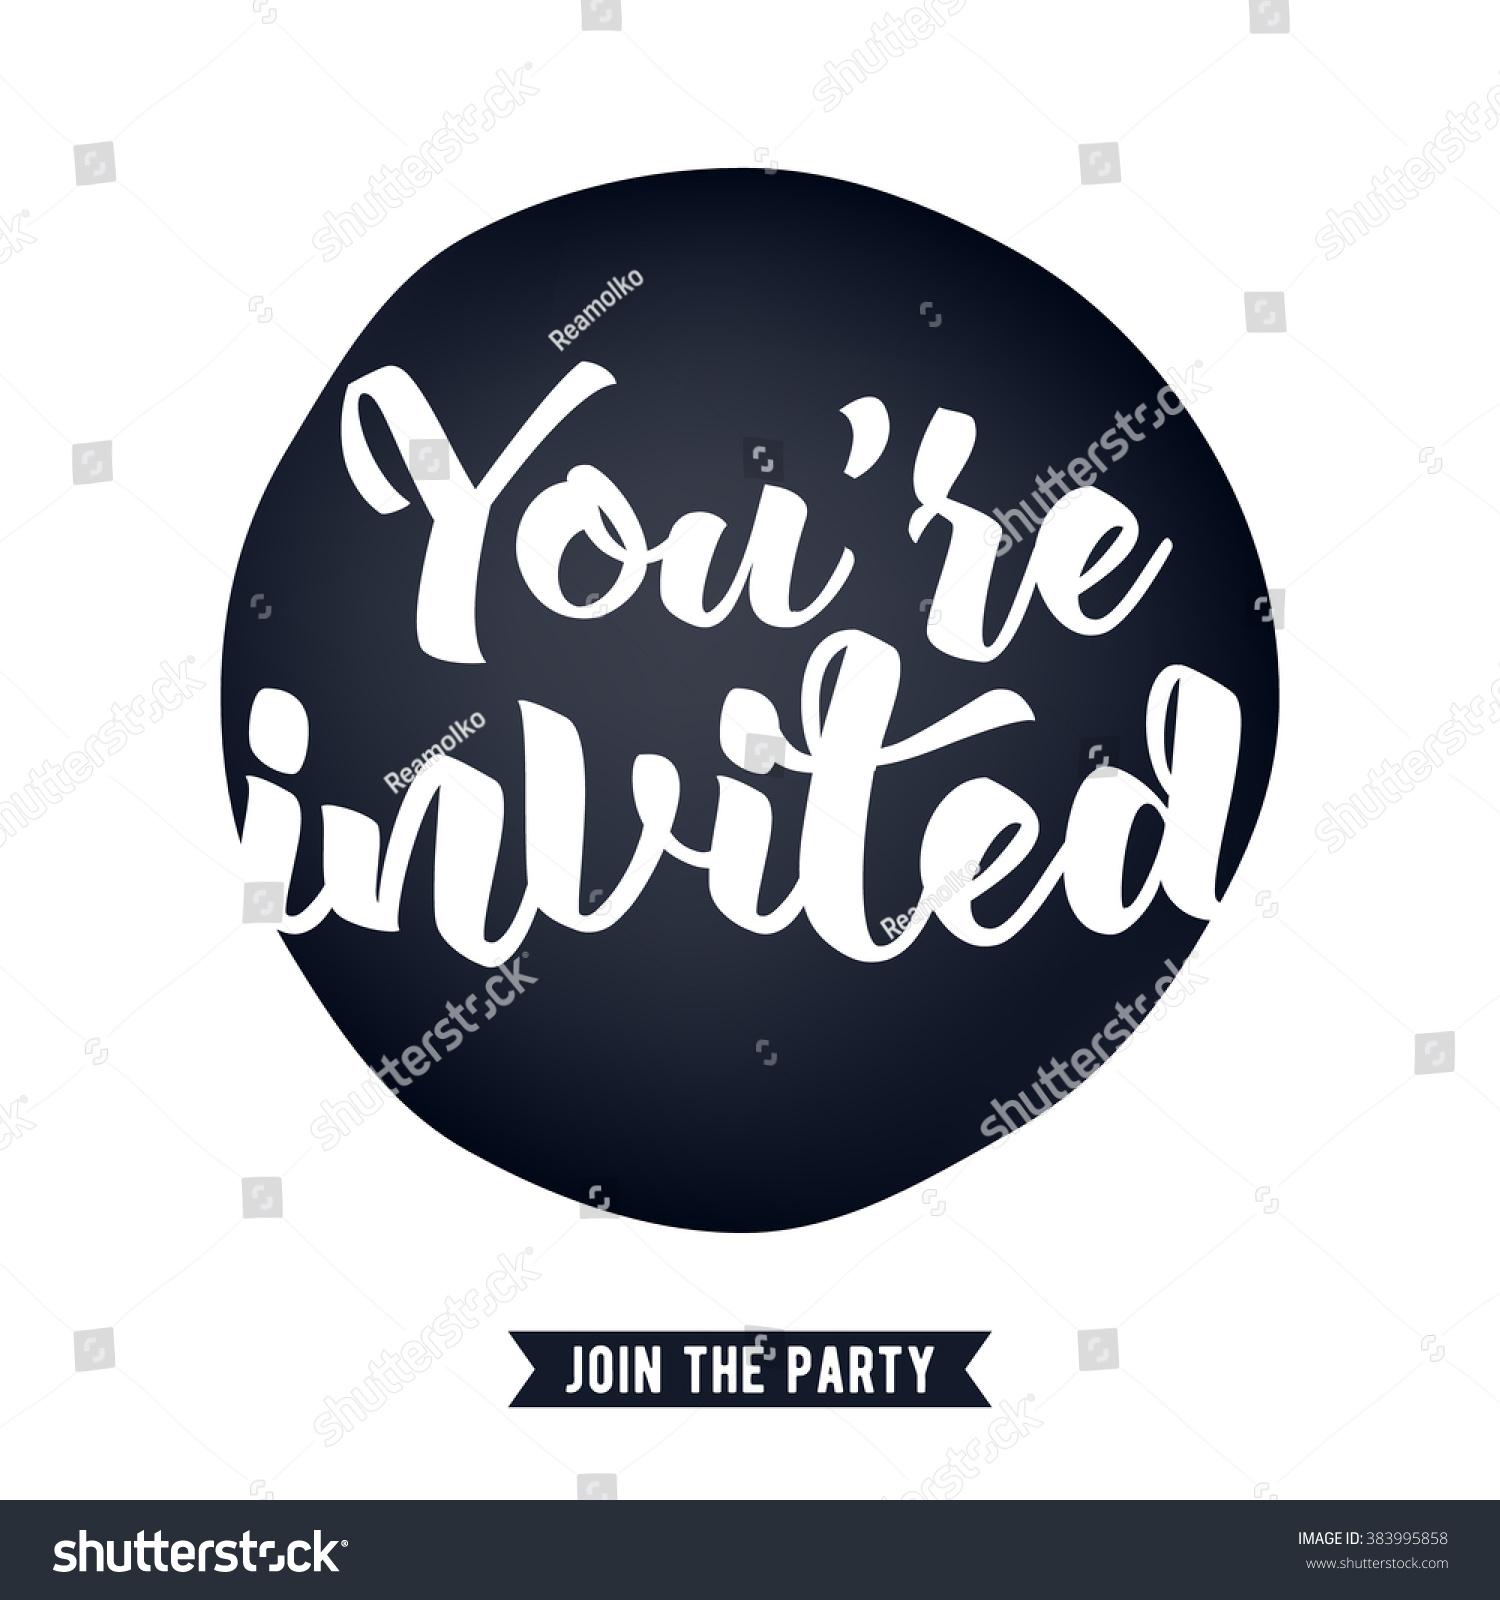 Youre Invited Lettering Design Vector Illustration Stock Vector ...